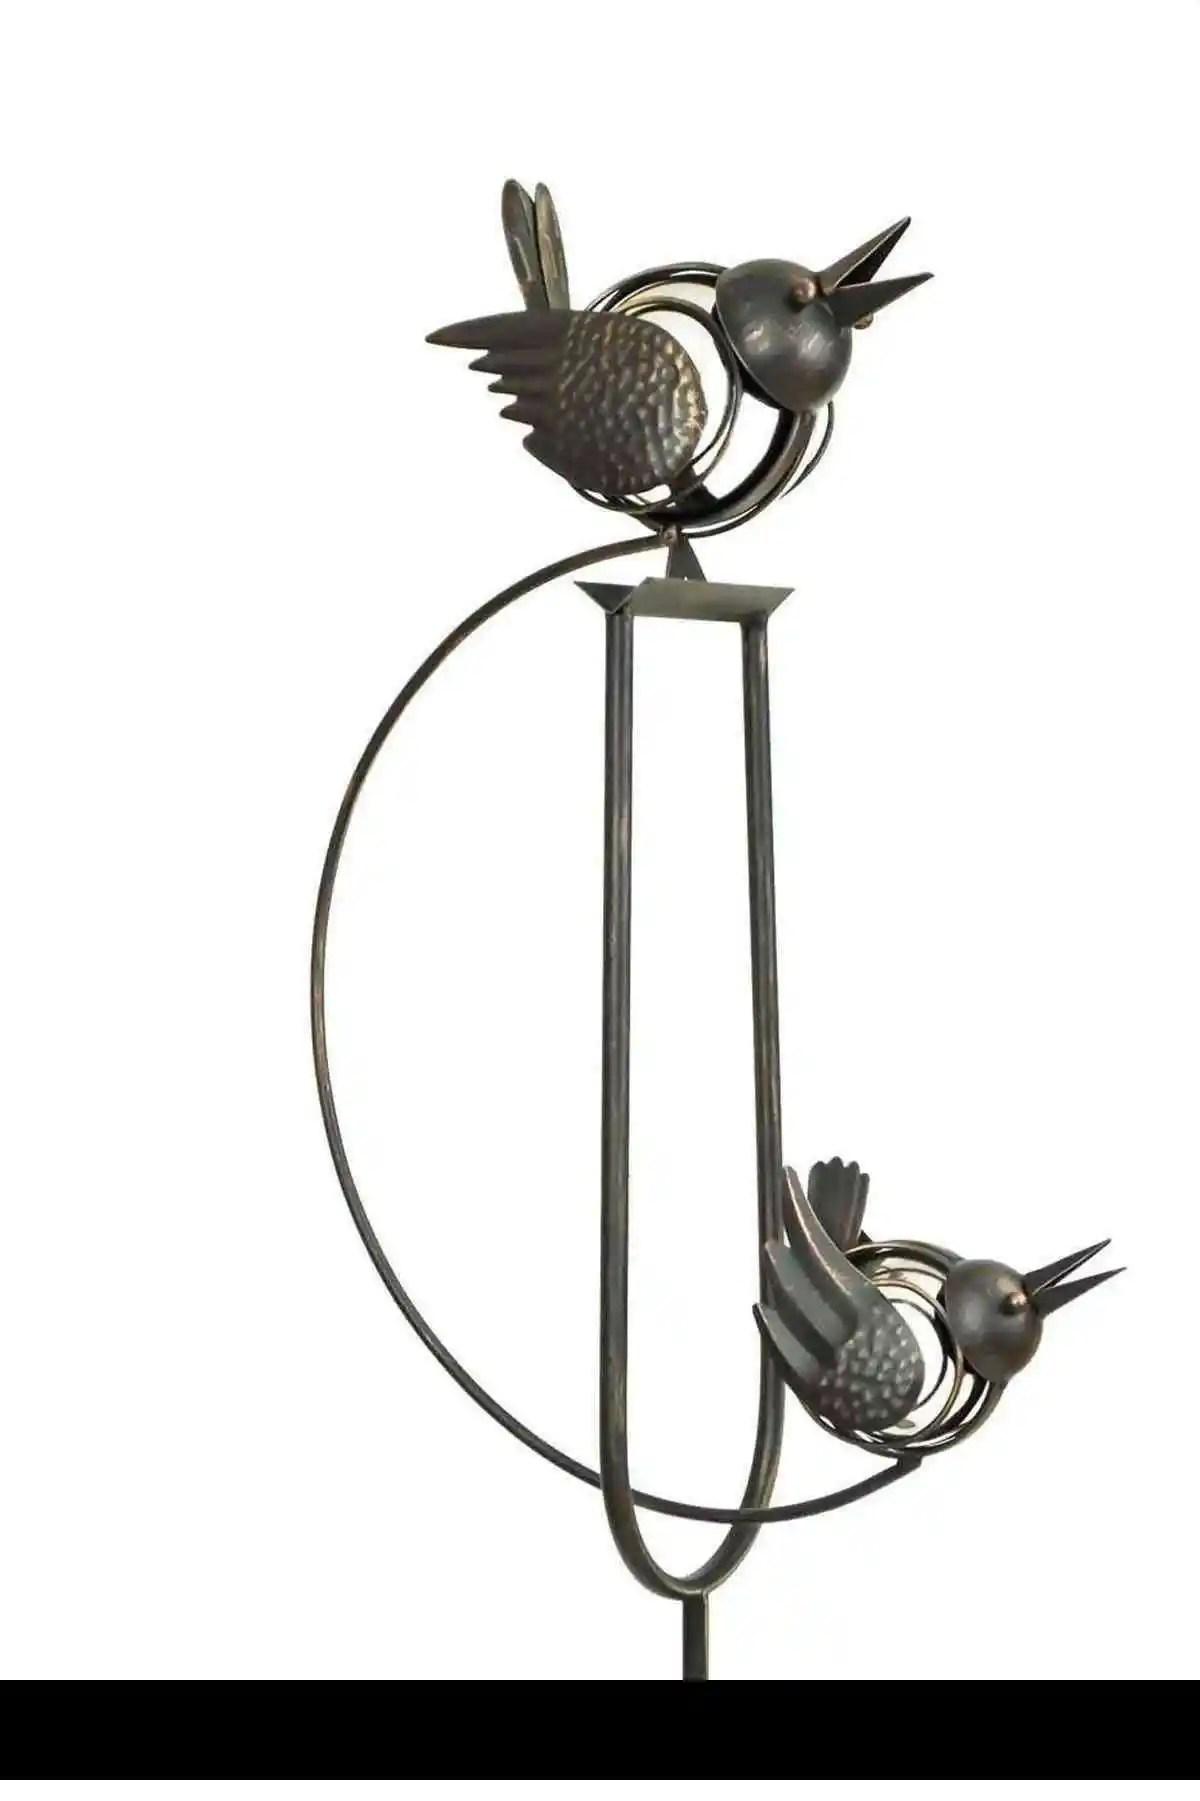 Rocking Balancing Big Love Birds Metal Garden Wind Spinner